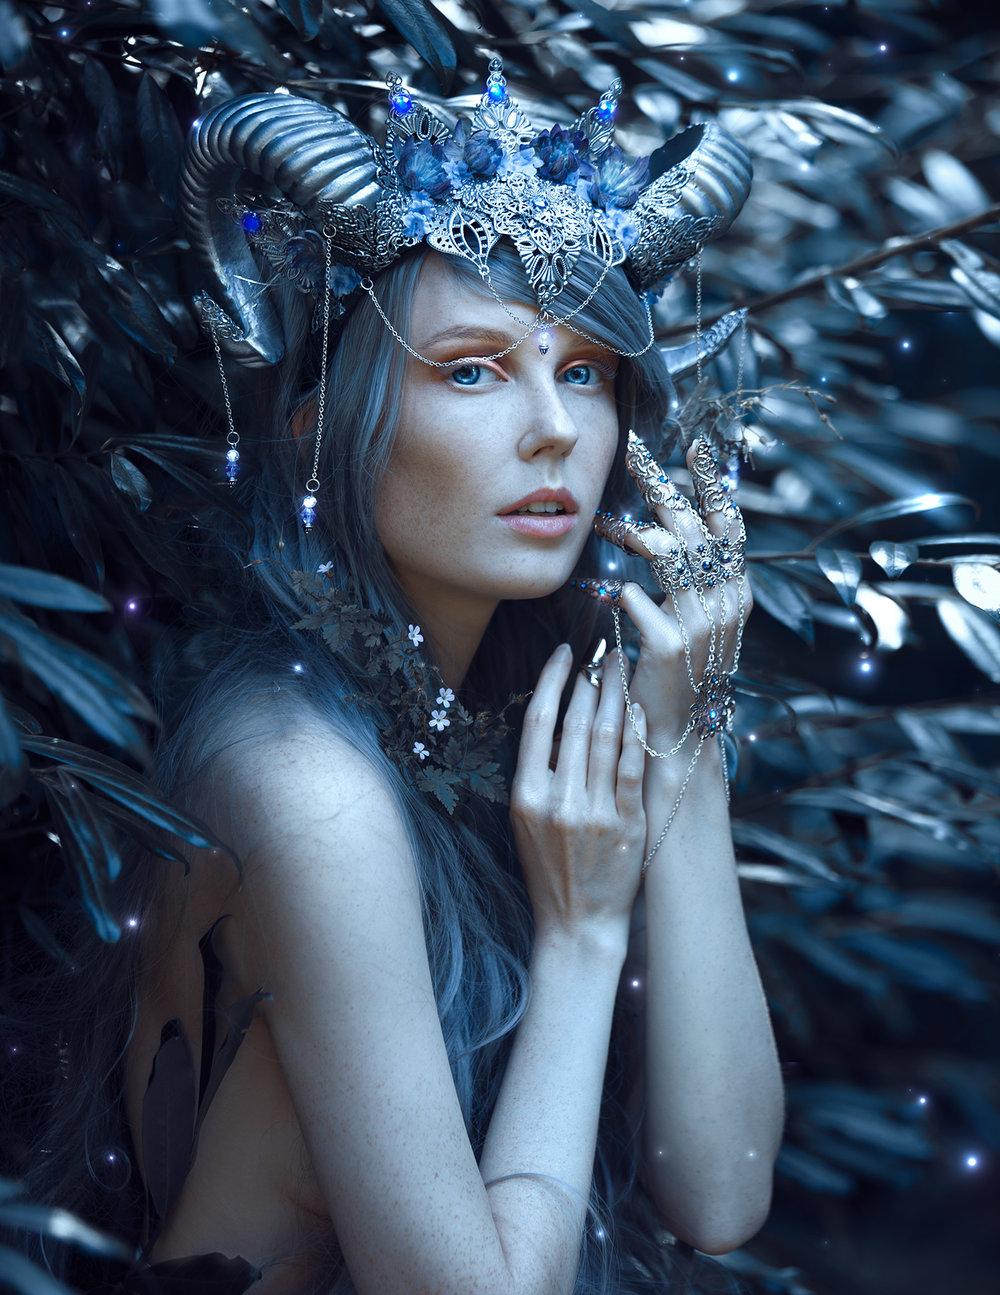 grace-almera-lisbeth-berg-ivy-design-horoscope-zodiac-sign-capricorn.jpg